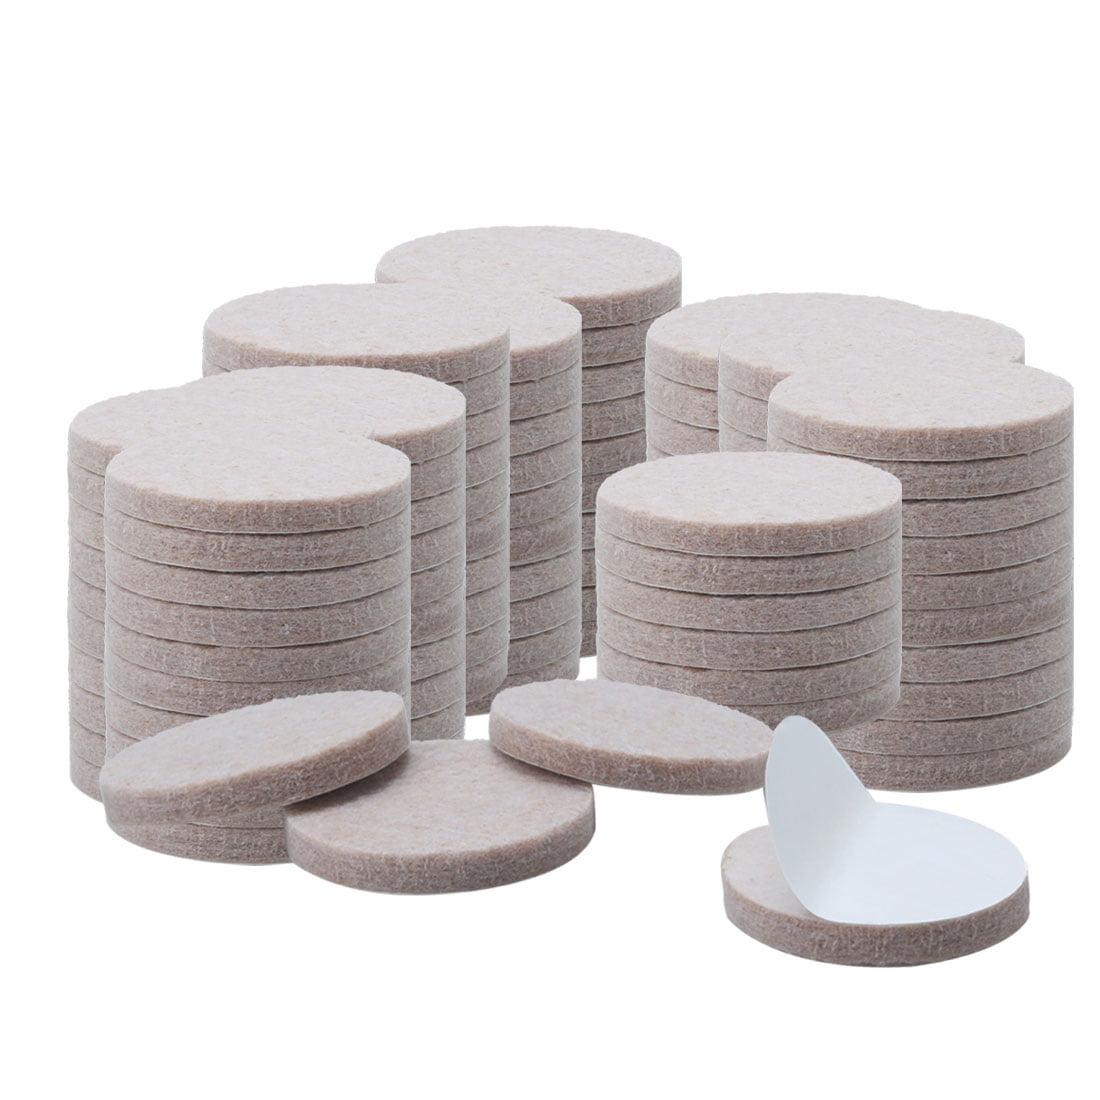 100pcs Felt Furniture Pads Round 7 8 Quot Floor Protector For